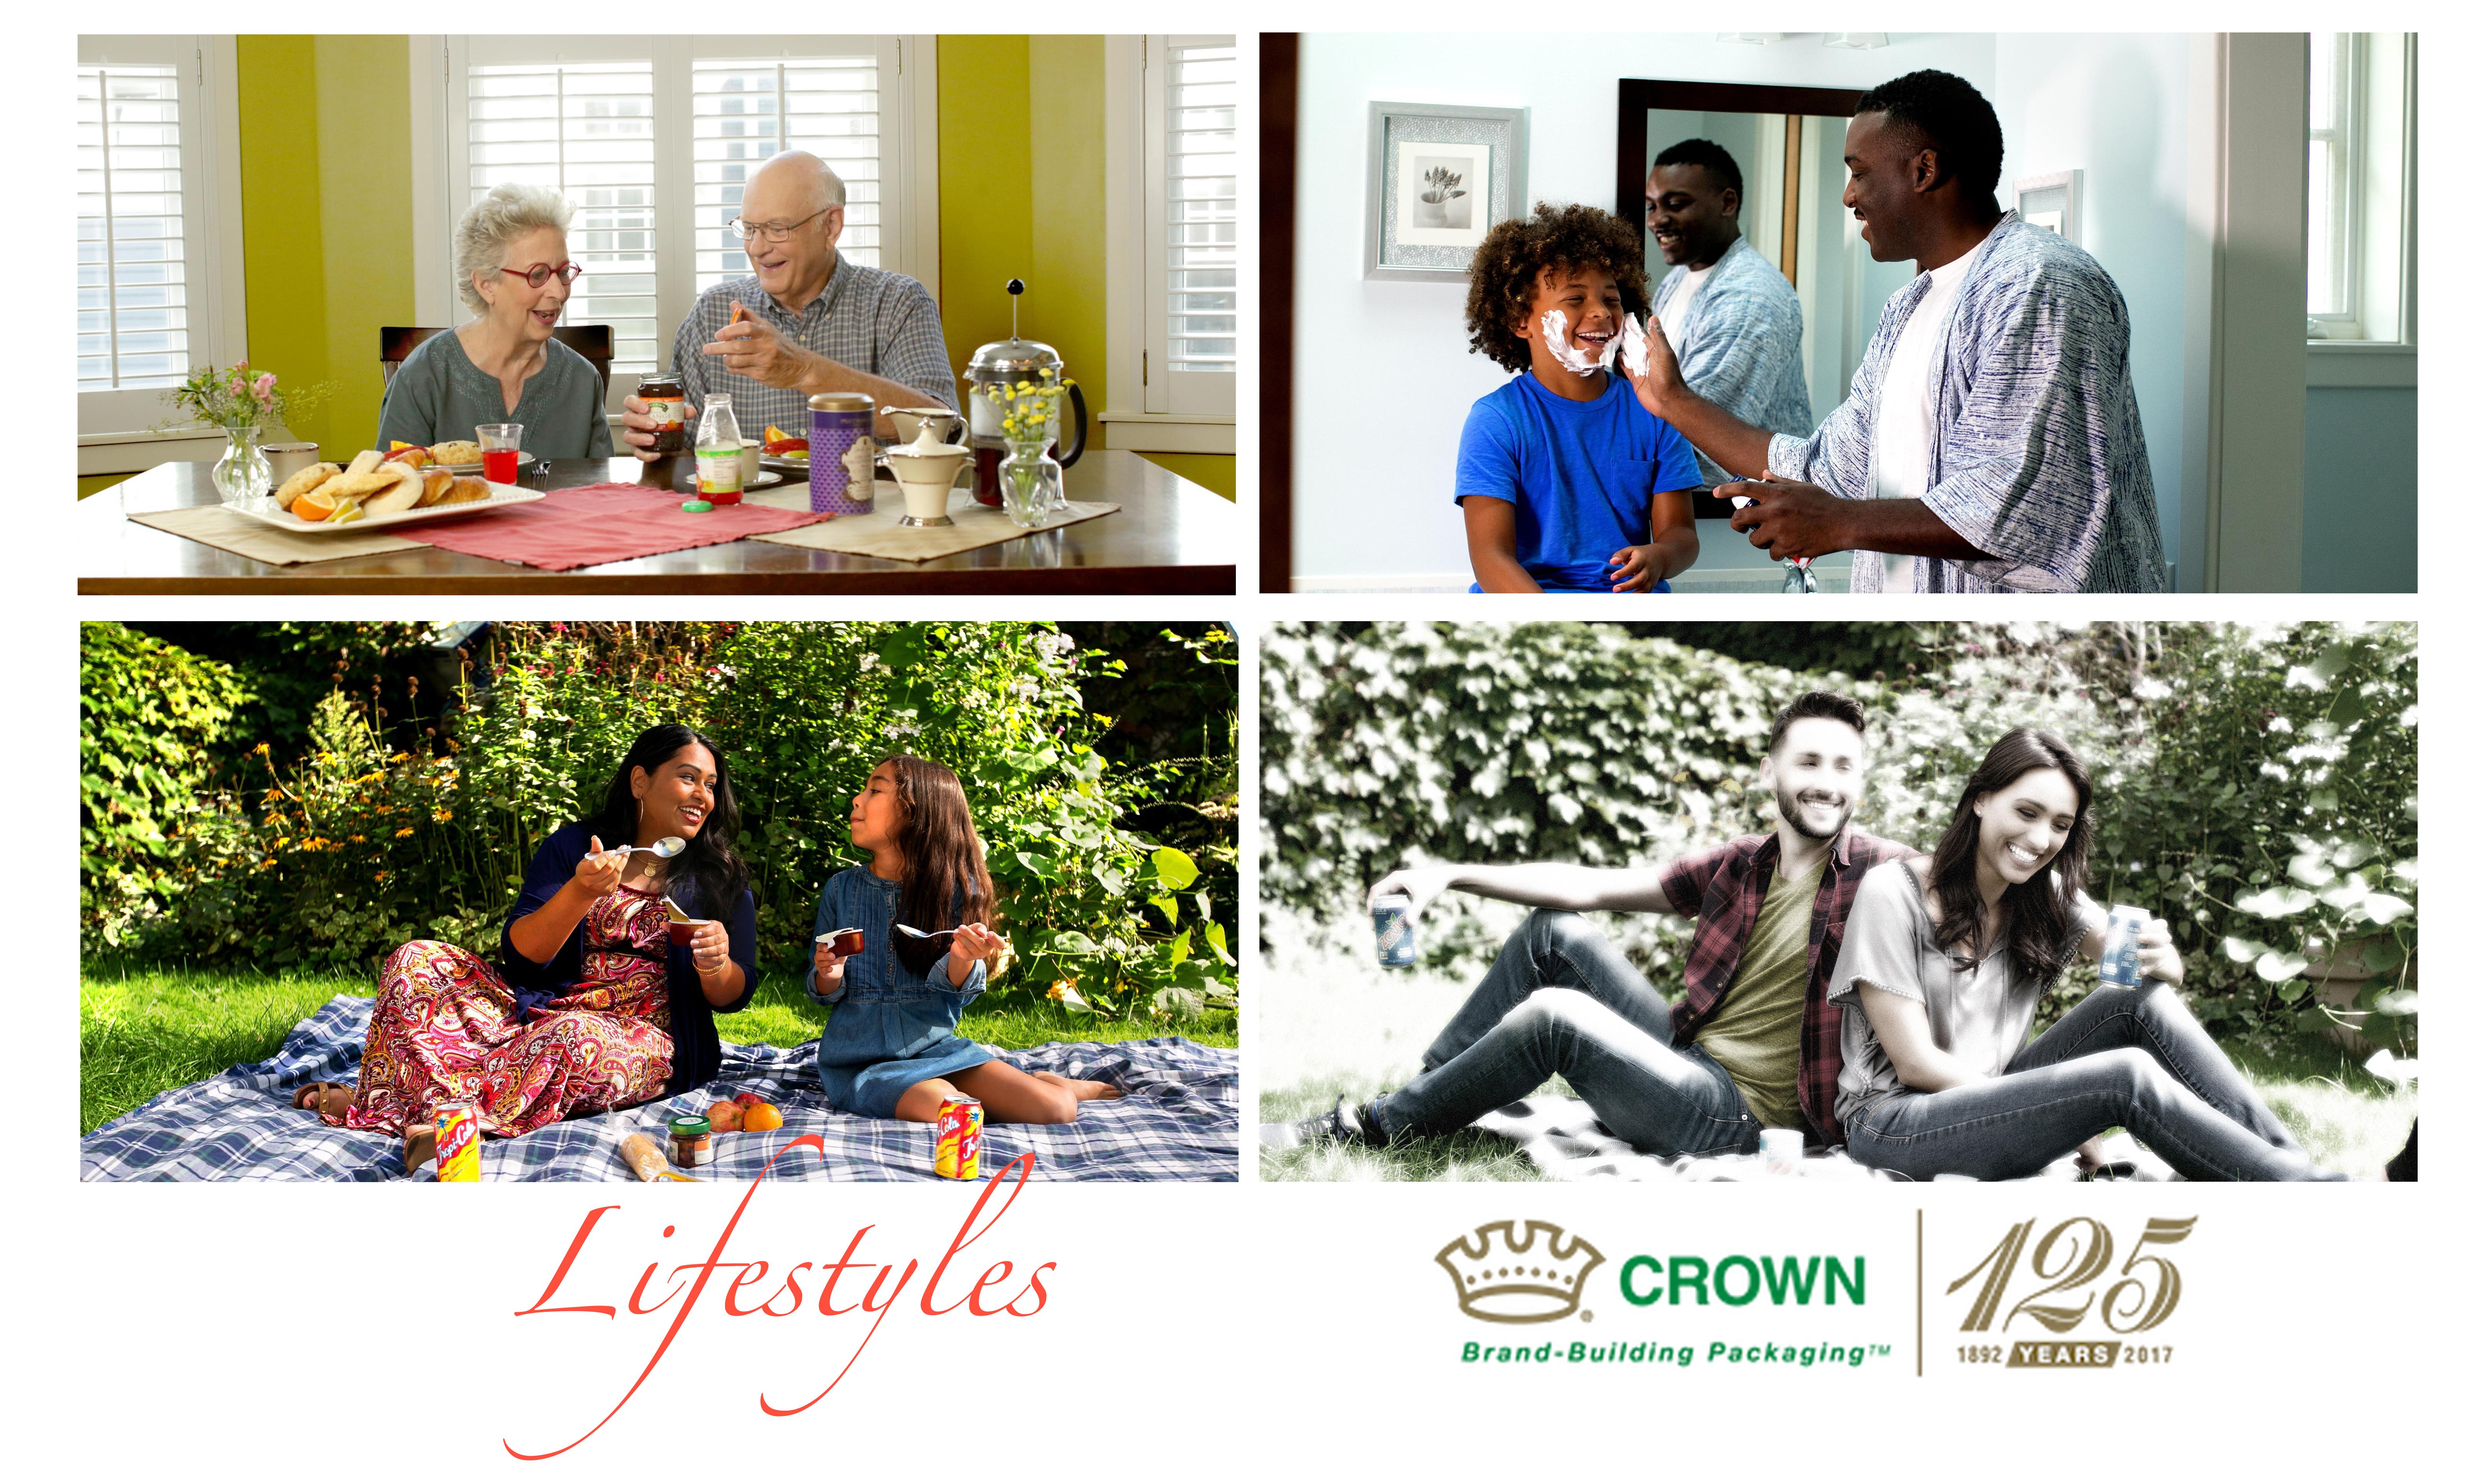 Lifestyles ad